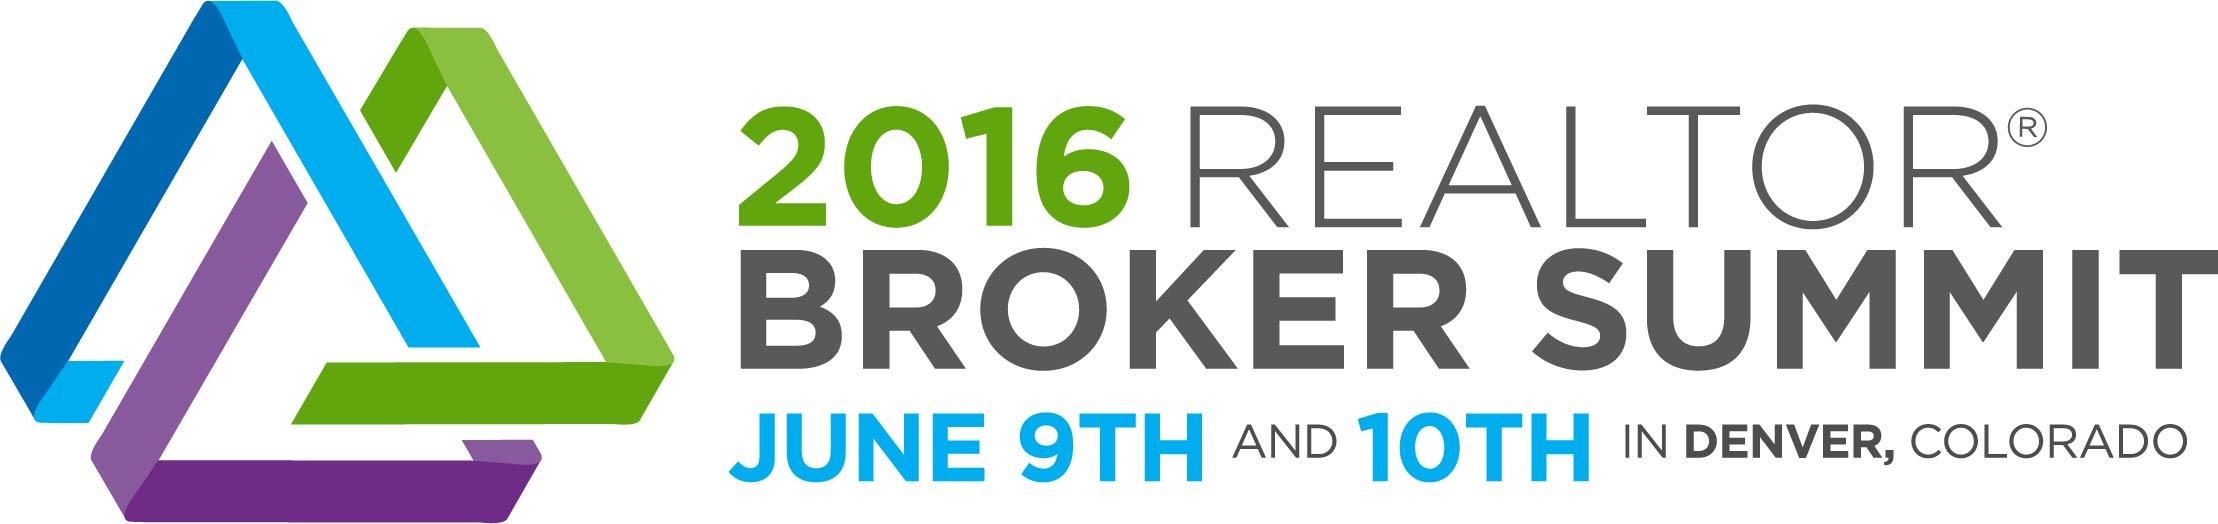 Broker Summit